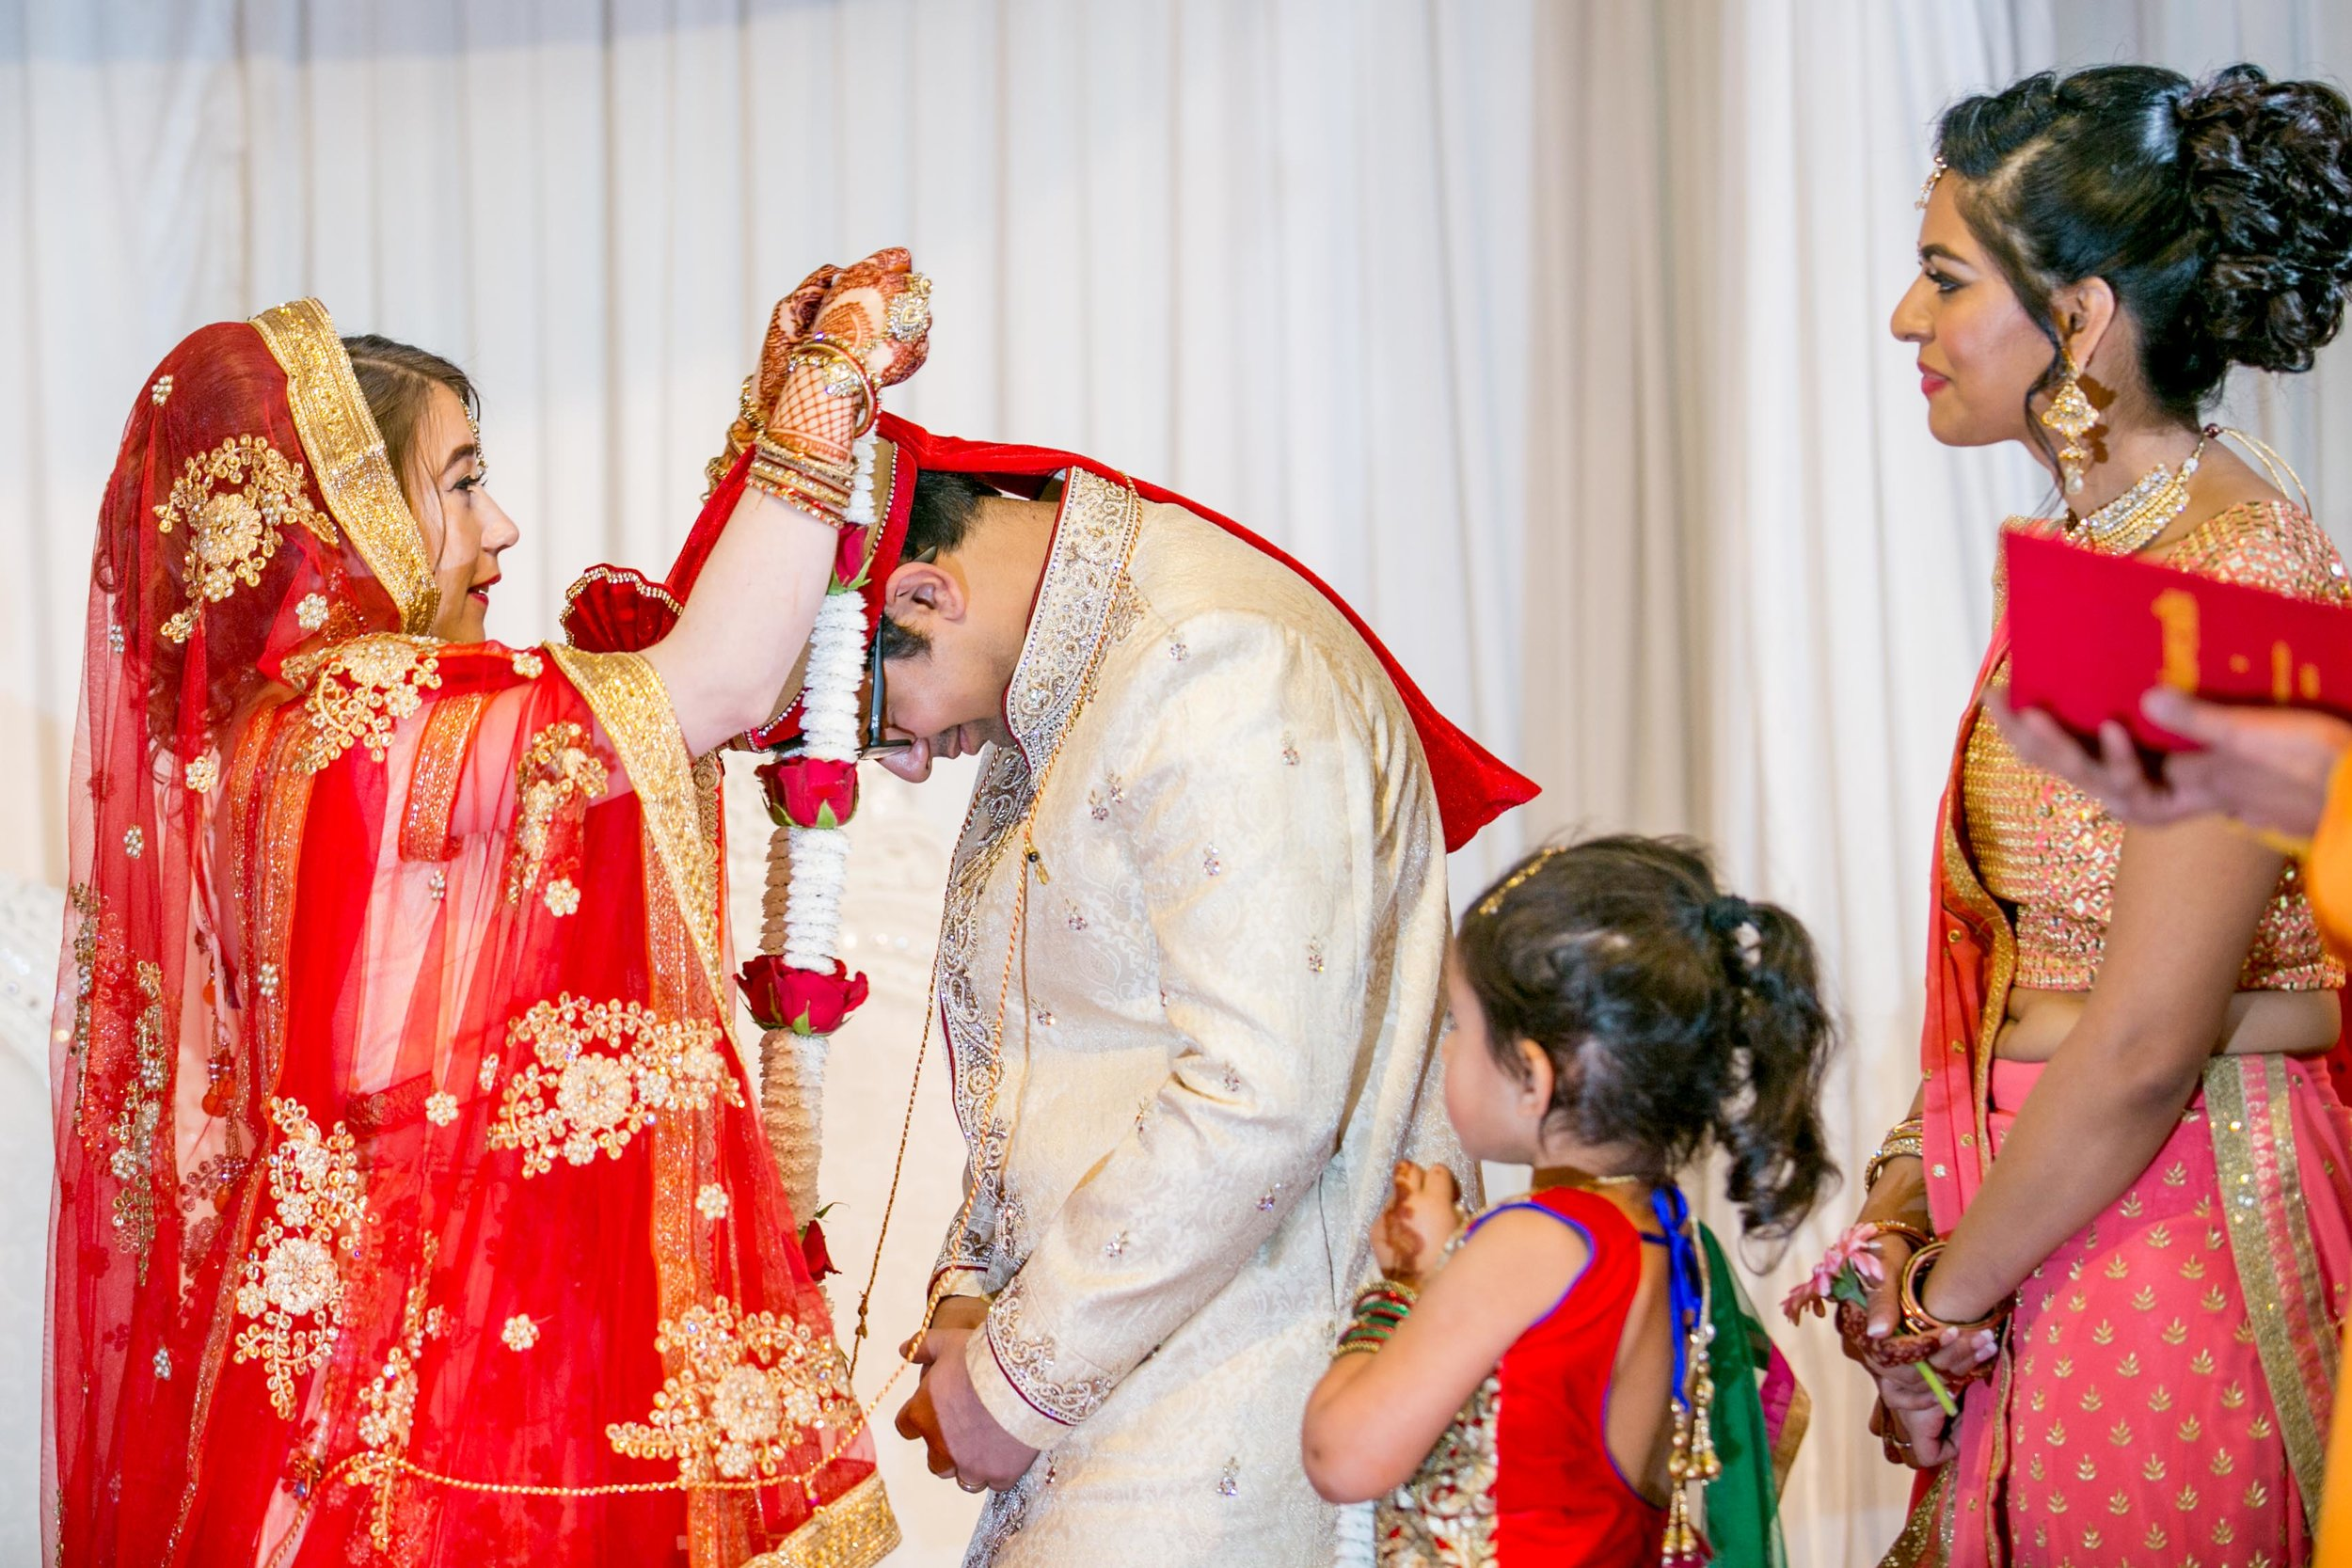 asian-Hindu-wedding-photographer-london-natalia-smith-photography-34.jpg